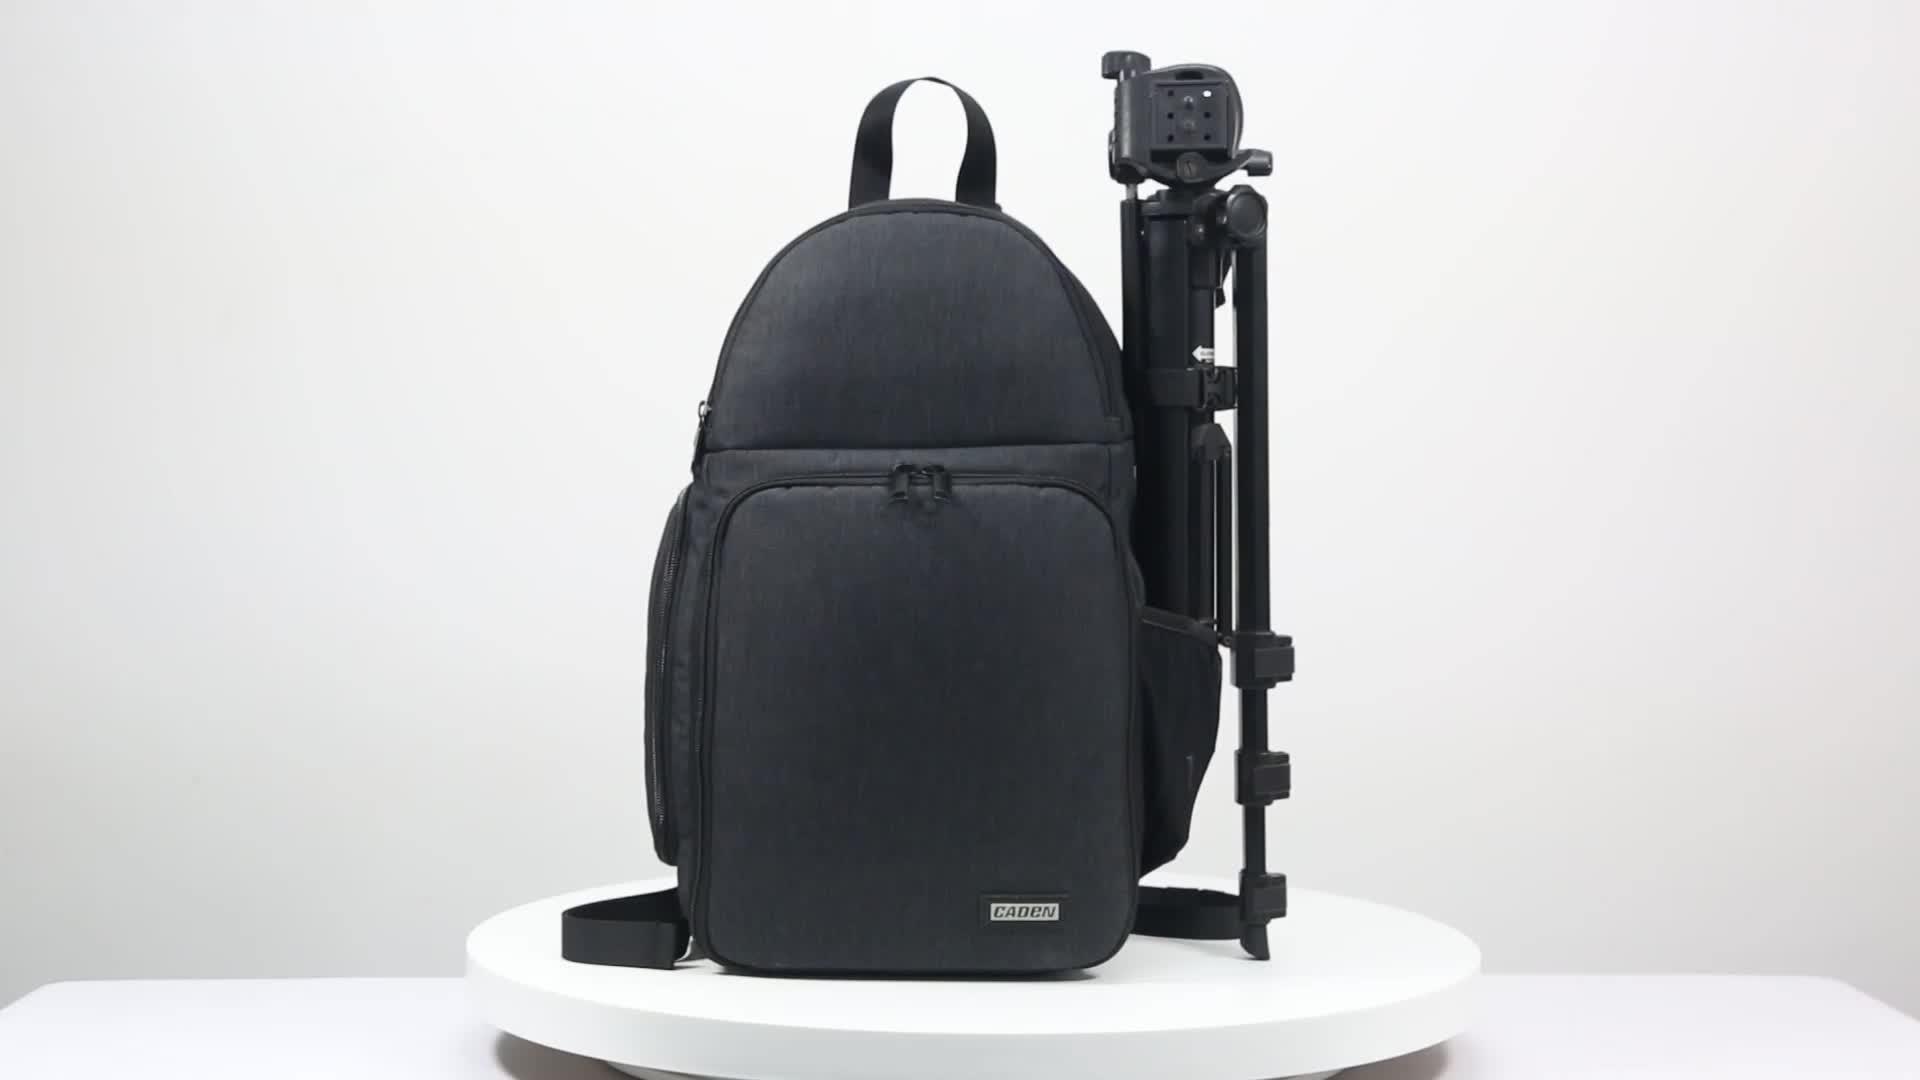 CADEN waterproof portable outdoor travel black detachable DSLR digital Camera Backpack bag